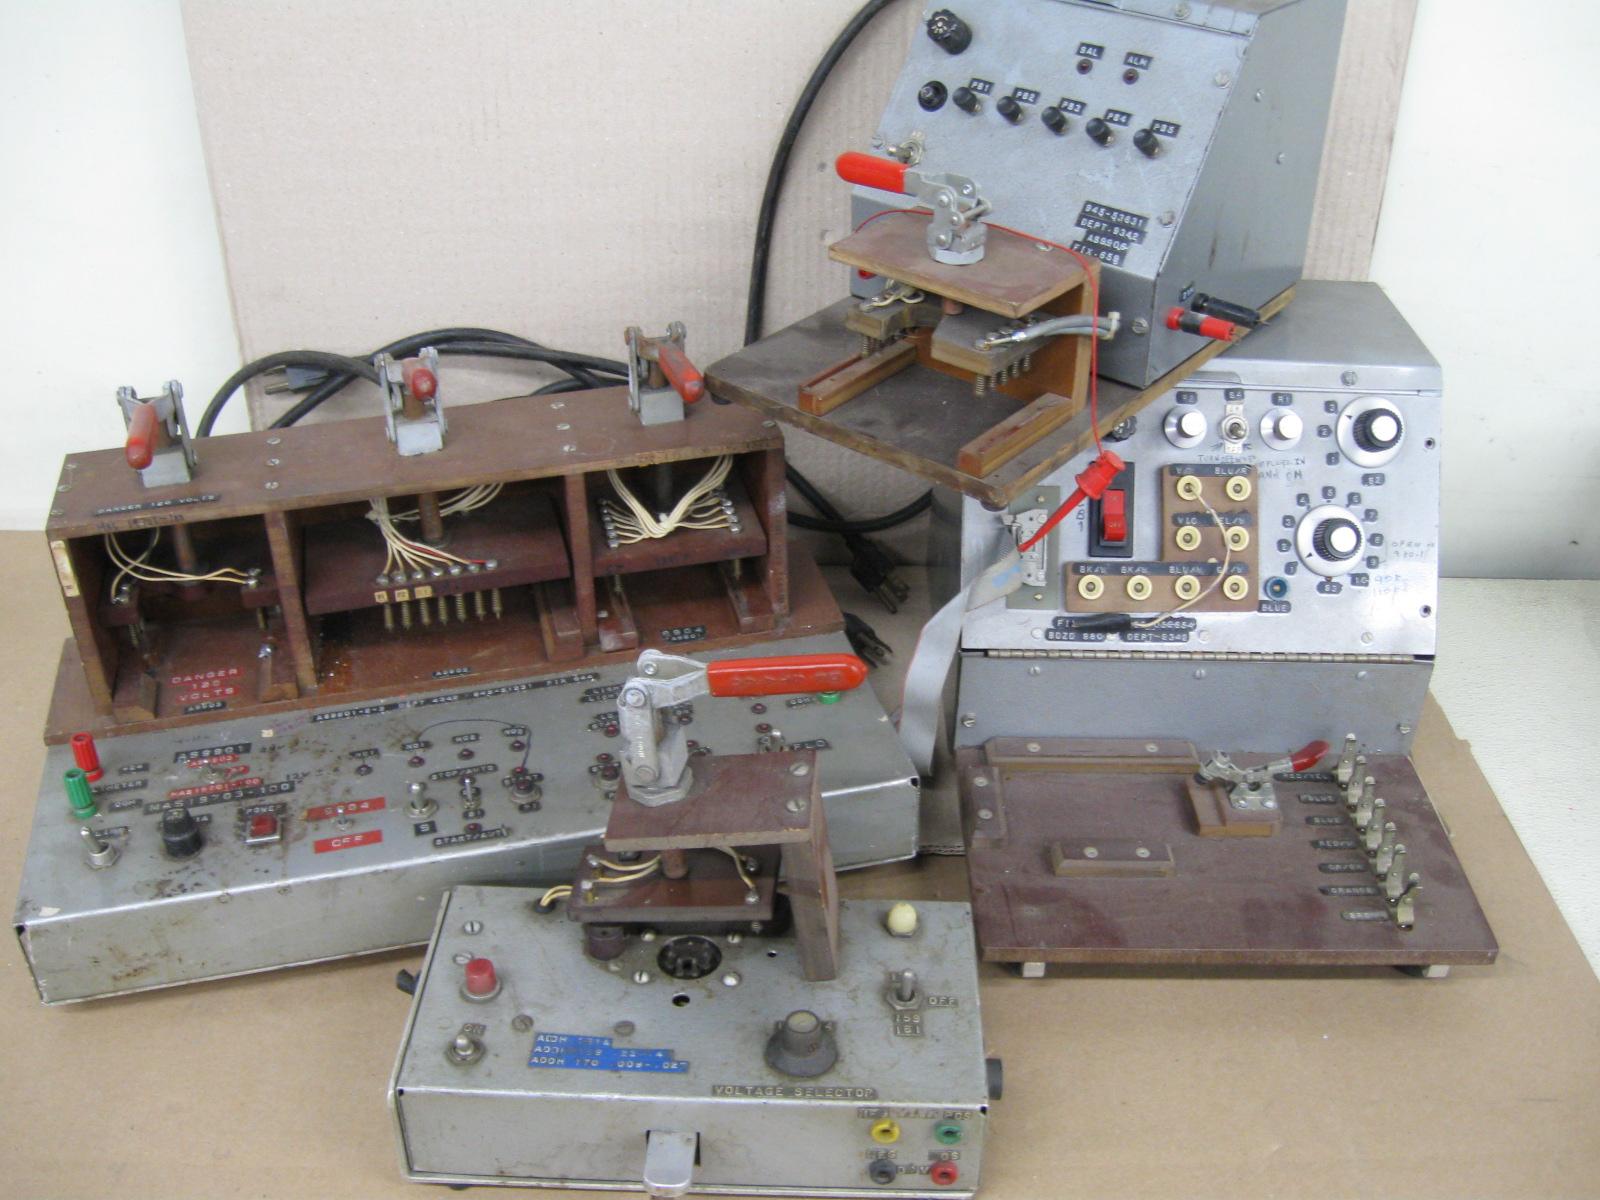 GWZ Surplus - GeeWhiZ what a deal!: Vintage Electrical Test